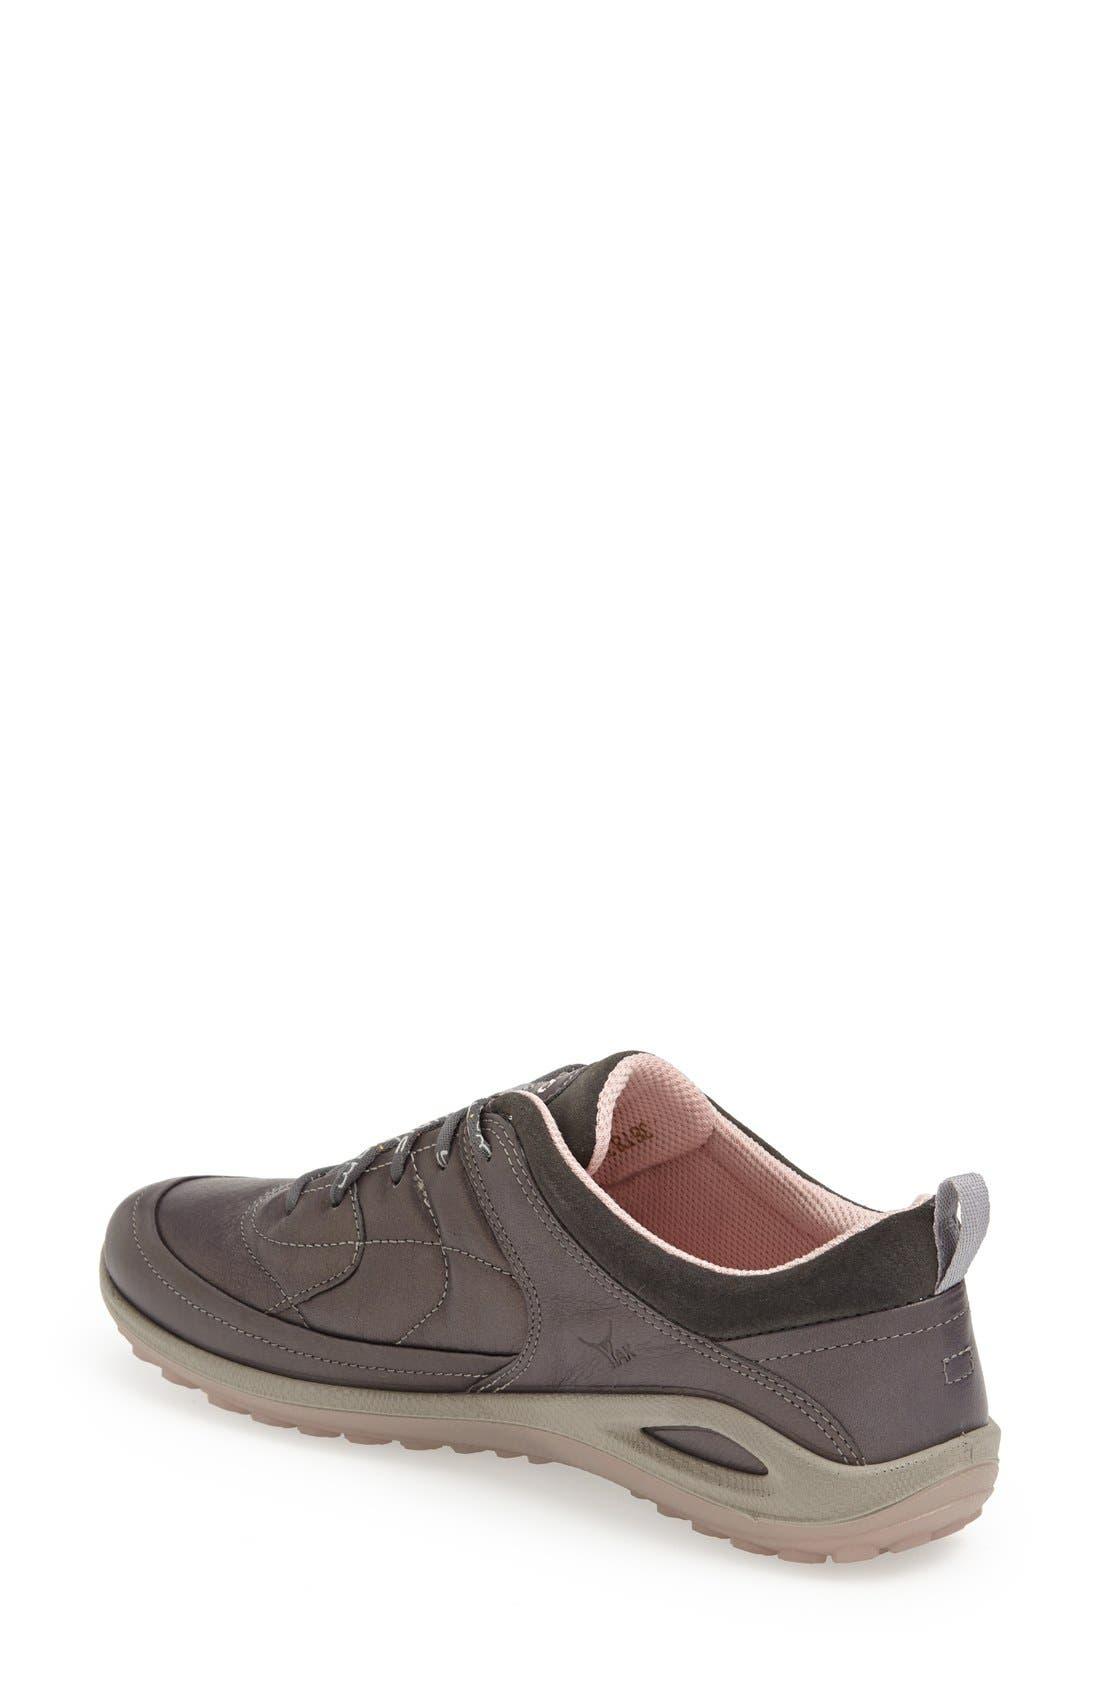 'Biom Grip Lite' Sneaker,                             Alternate thumbnail 4, color,                             023